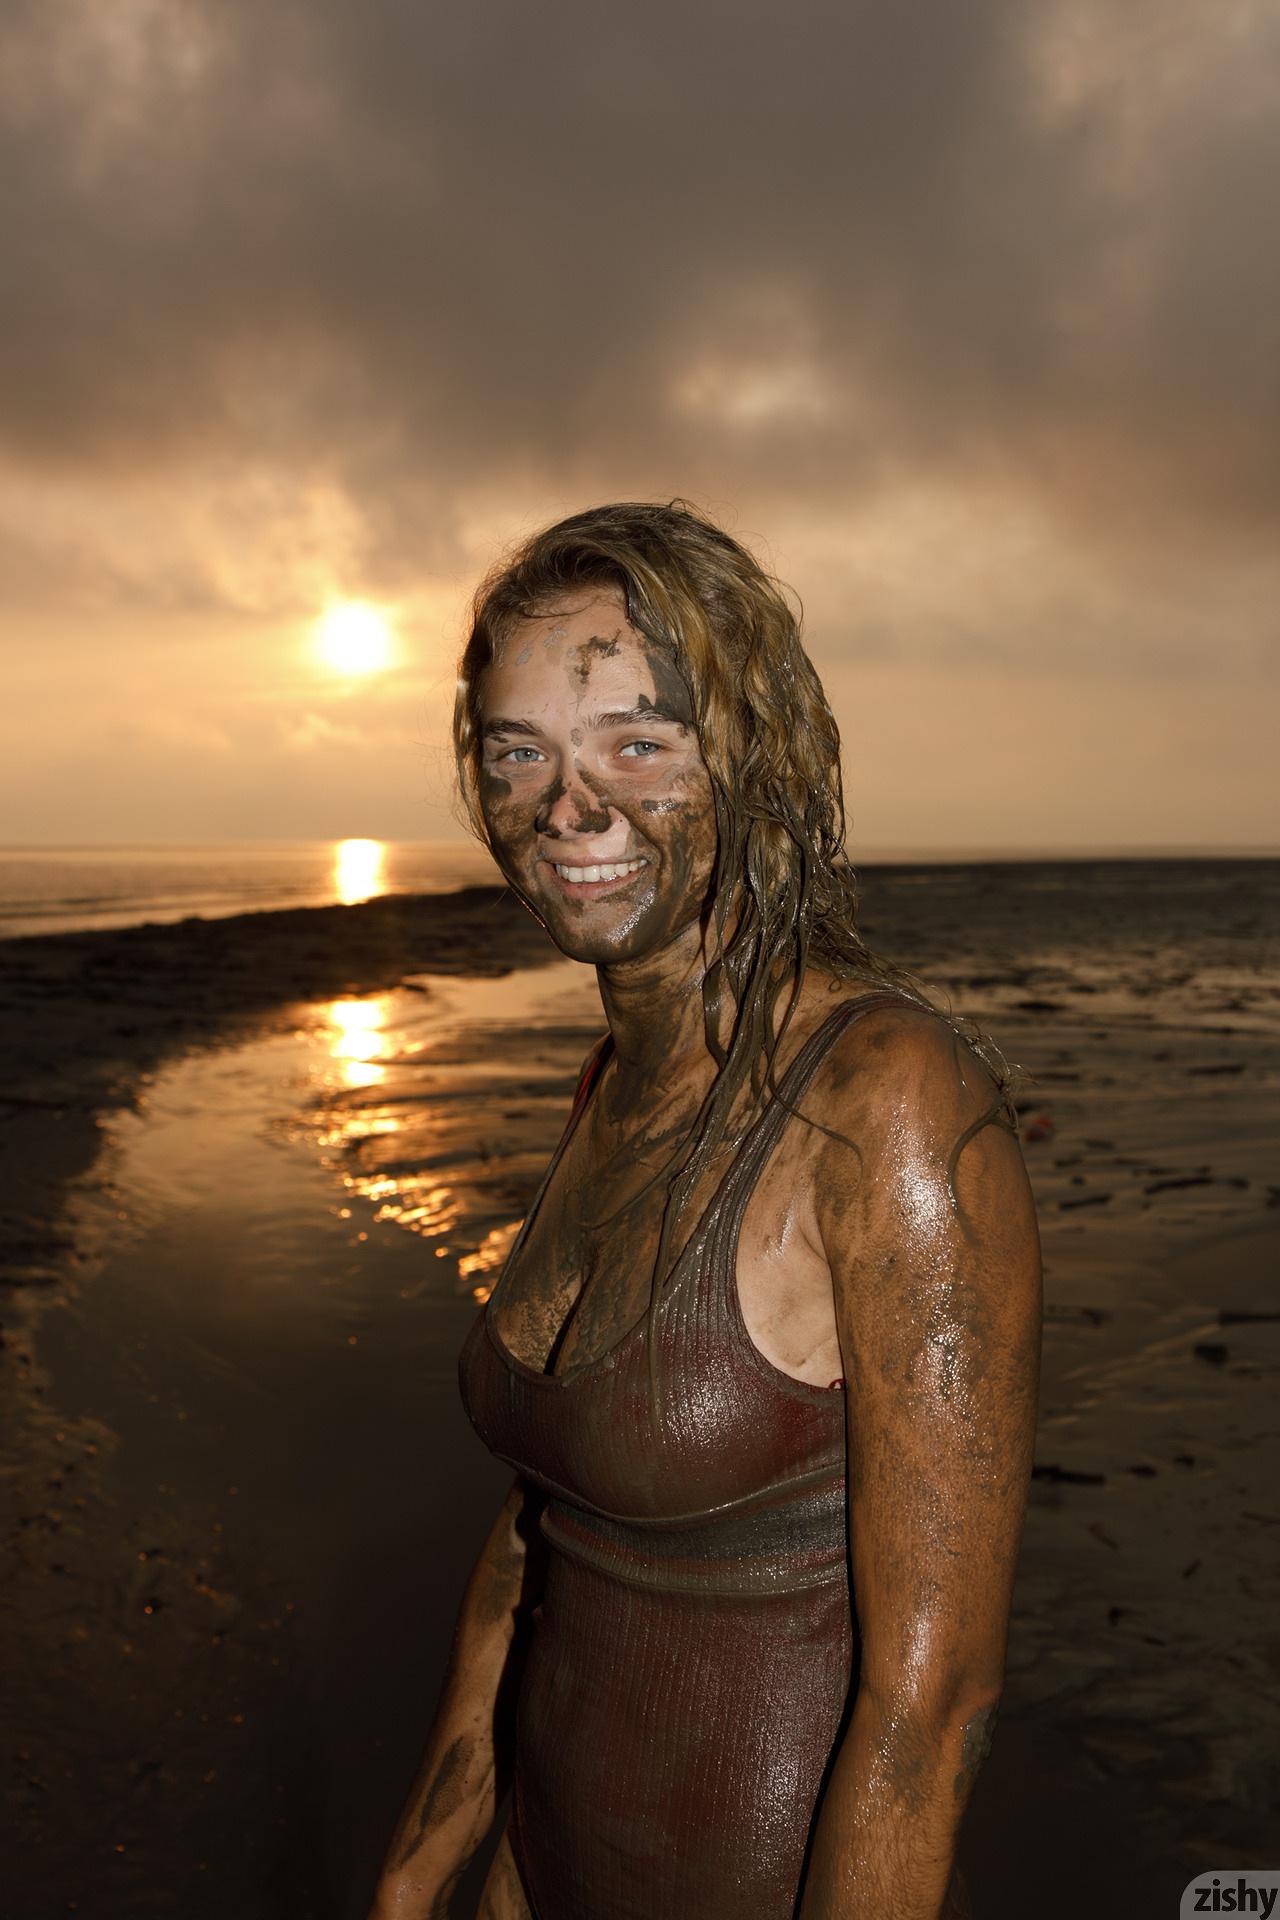 Sofia Orlova On Gryaznyy Beach Zishy (58)